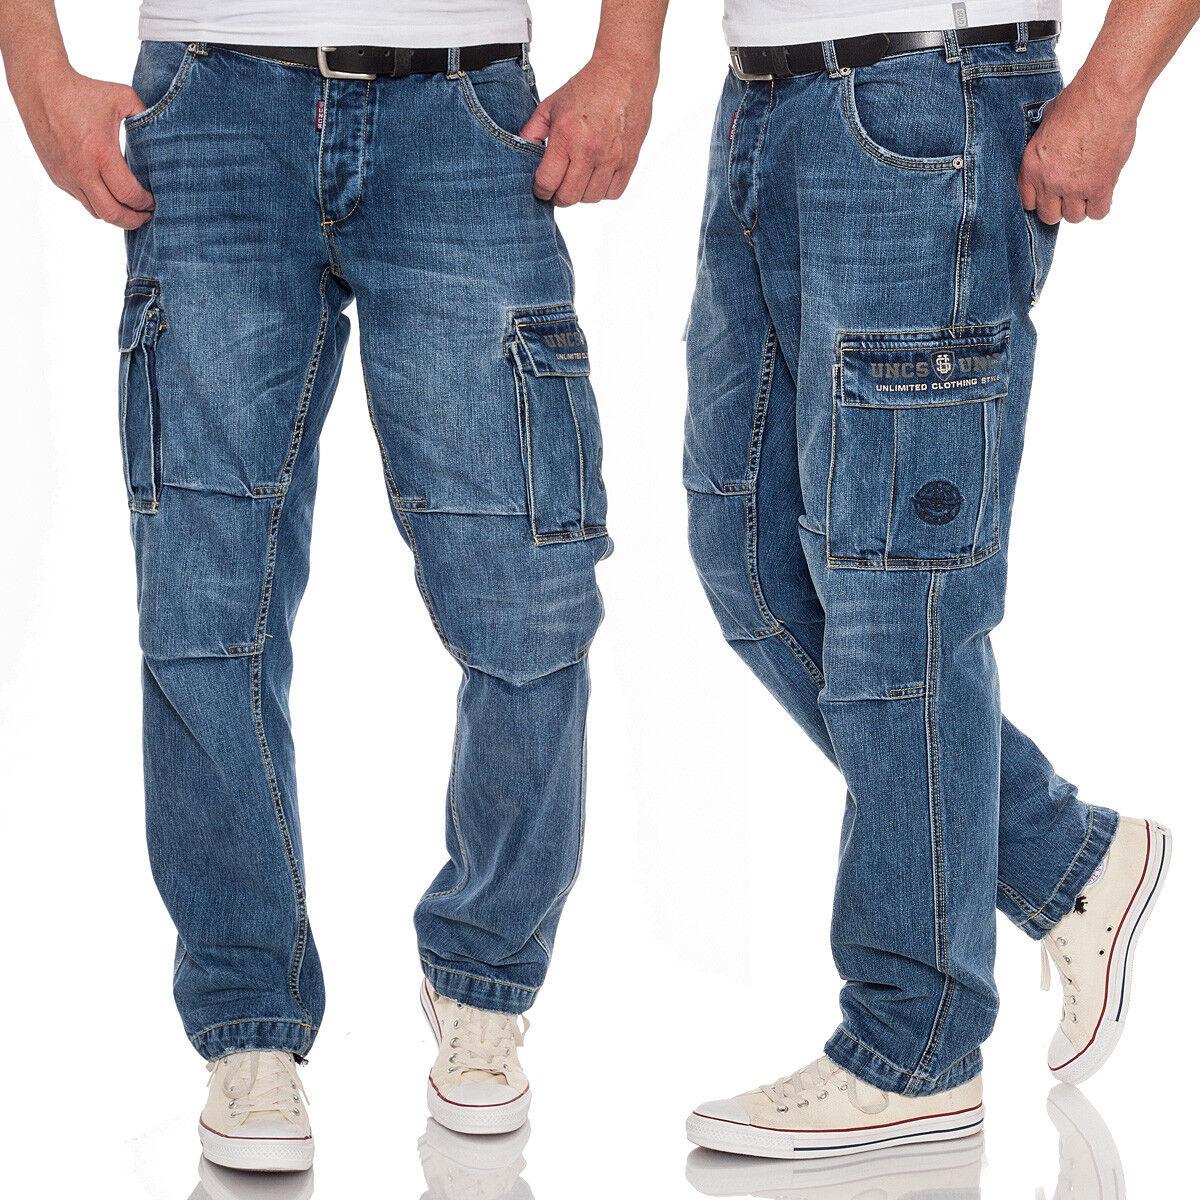 Caballeros UNCs Cochego jeans denim Cochego  Pants bolsillos laterales Biker jeans workerjeans  tienda